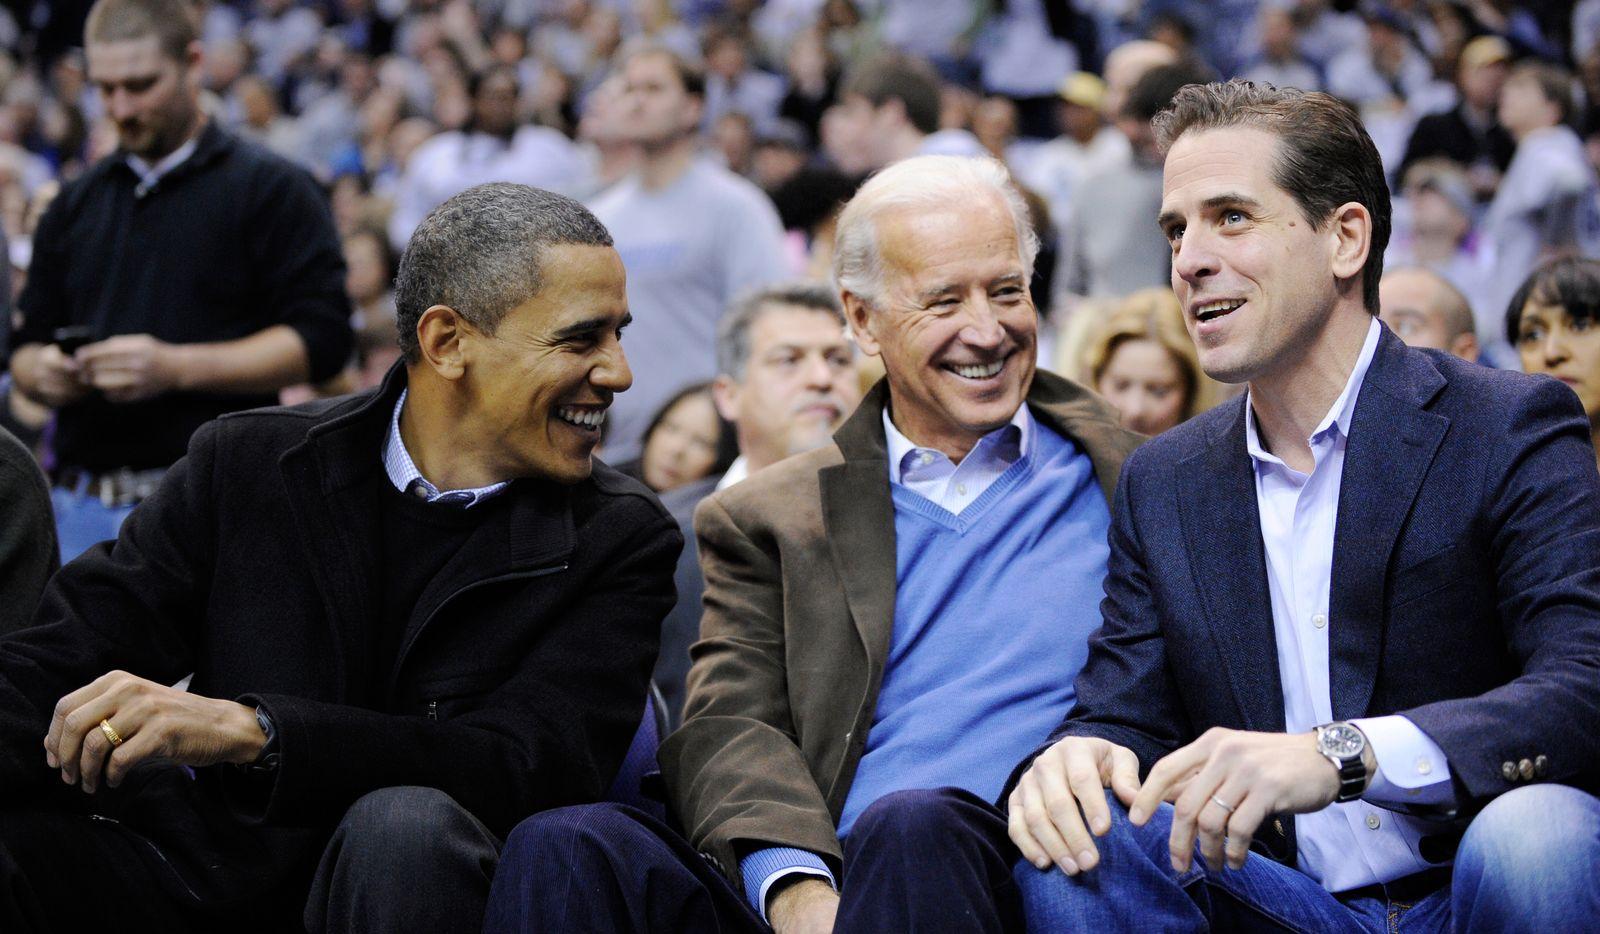 Joe Biden / Hunter Biden